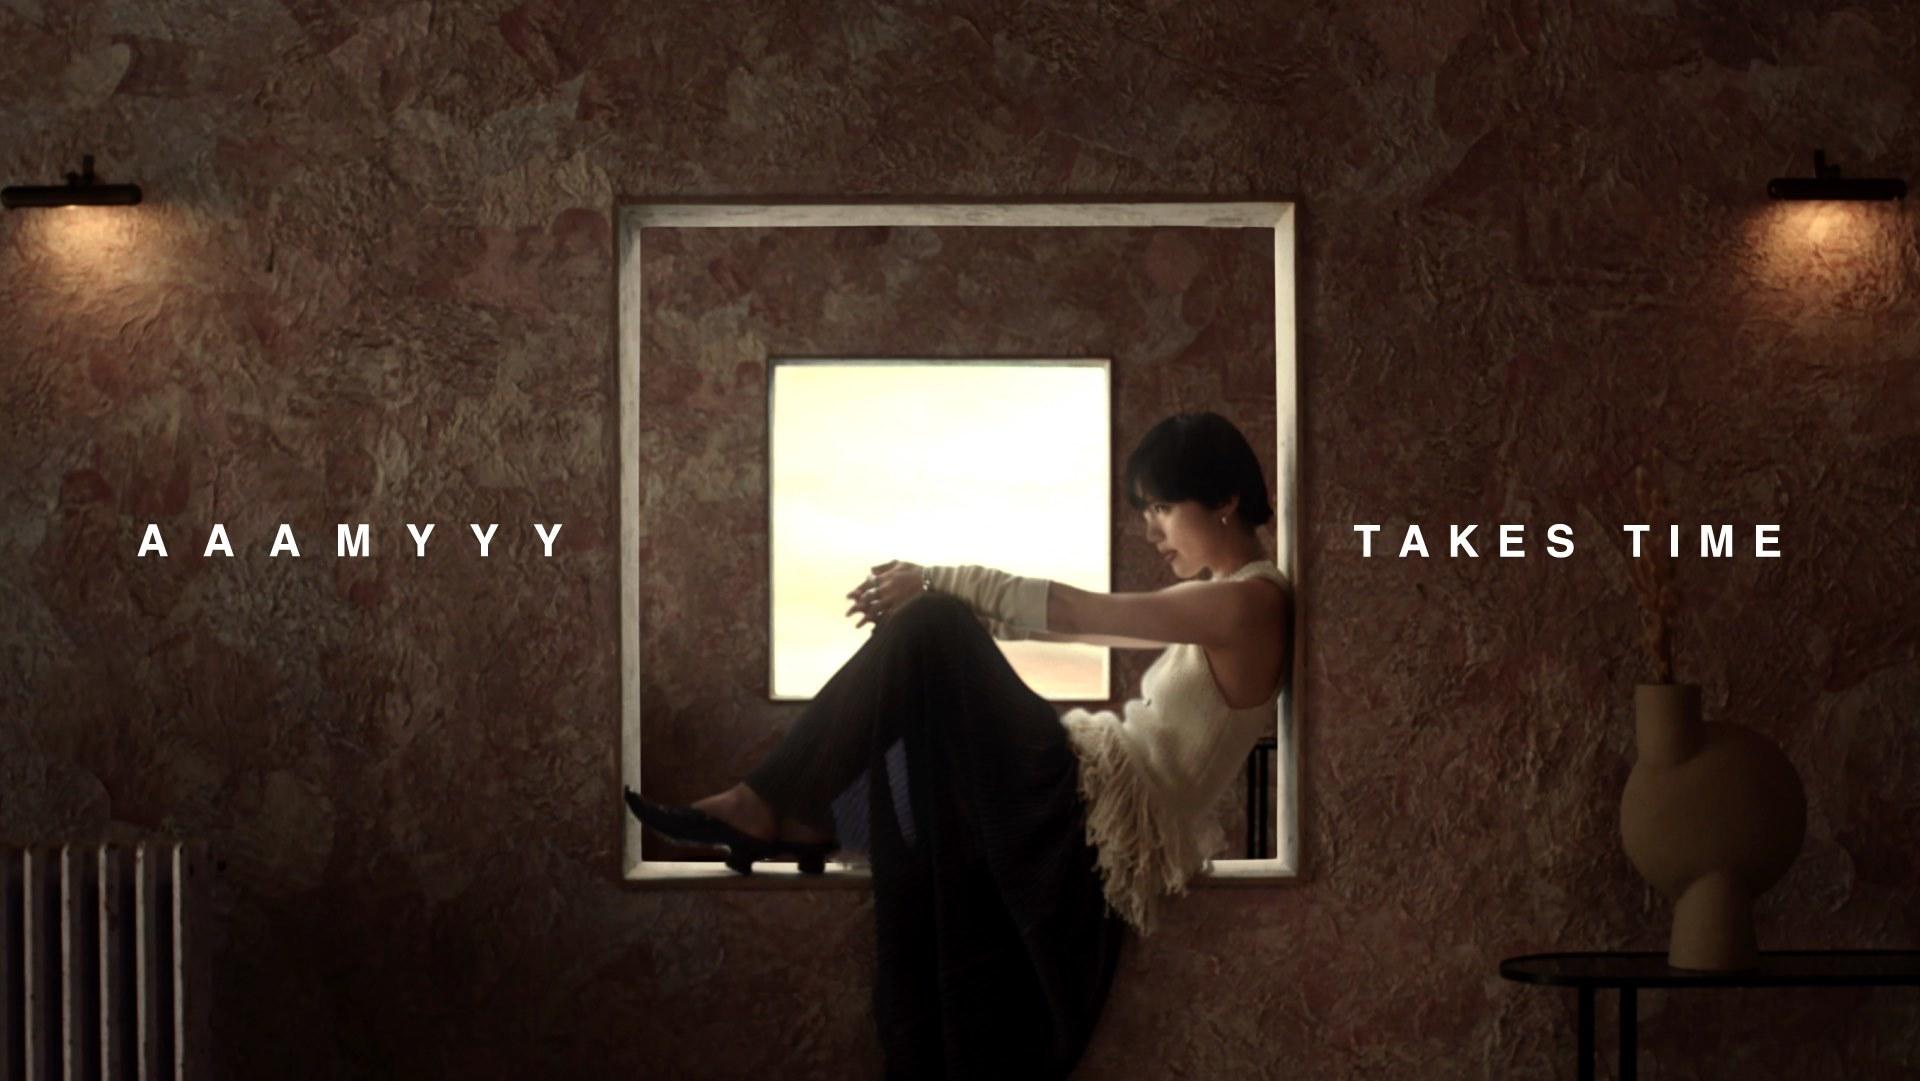 「TAKES TIME」MVサムネイル